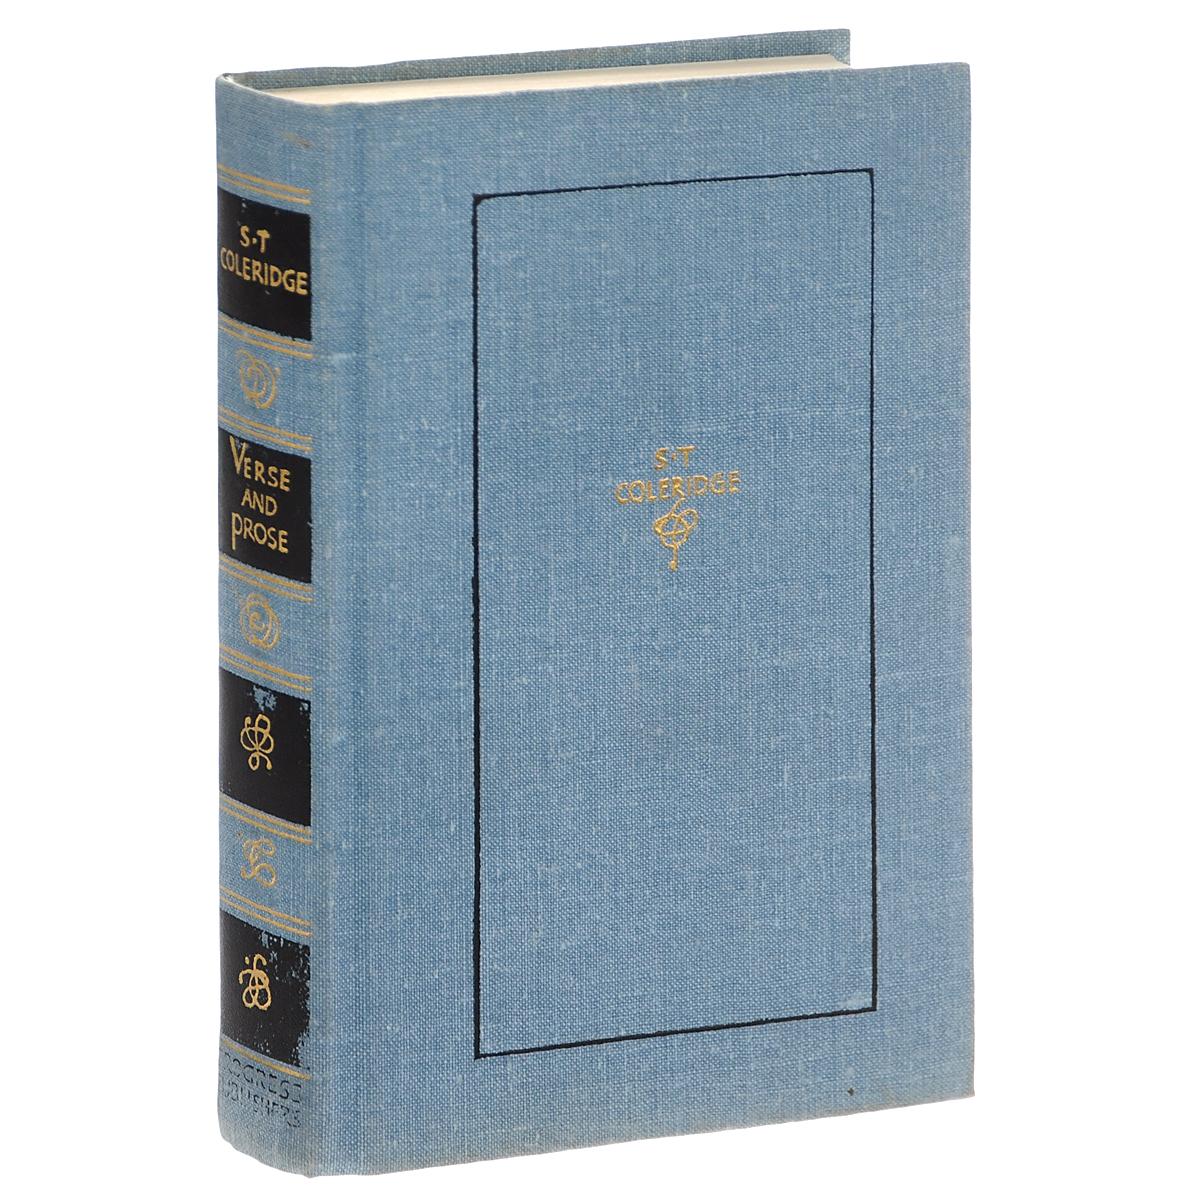 S. T. Coleridge: Verse and Prose